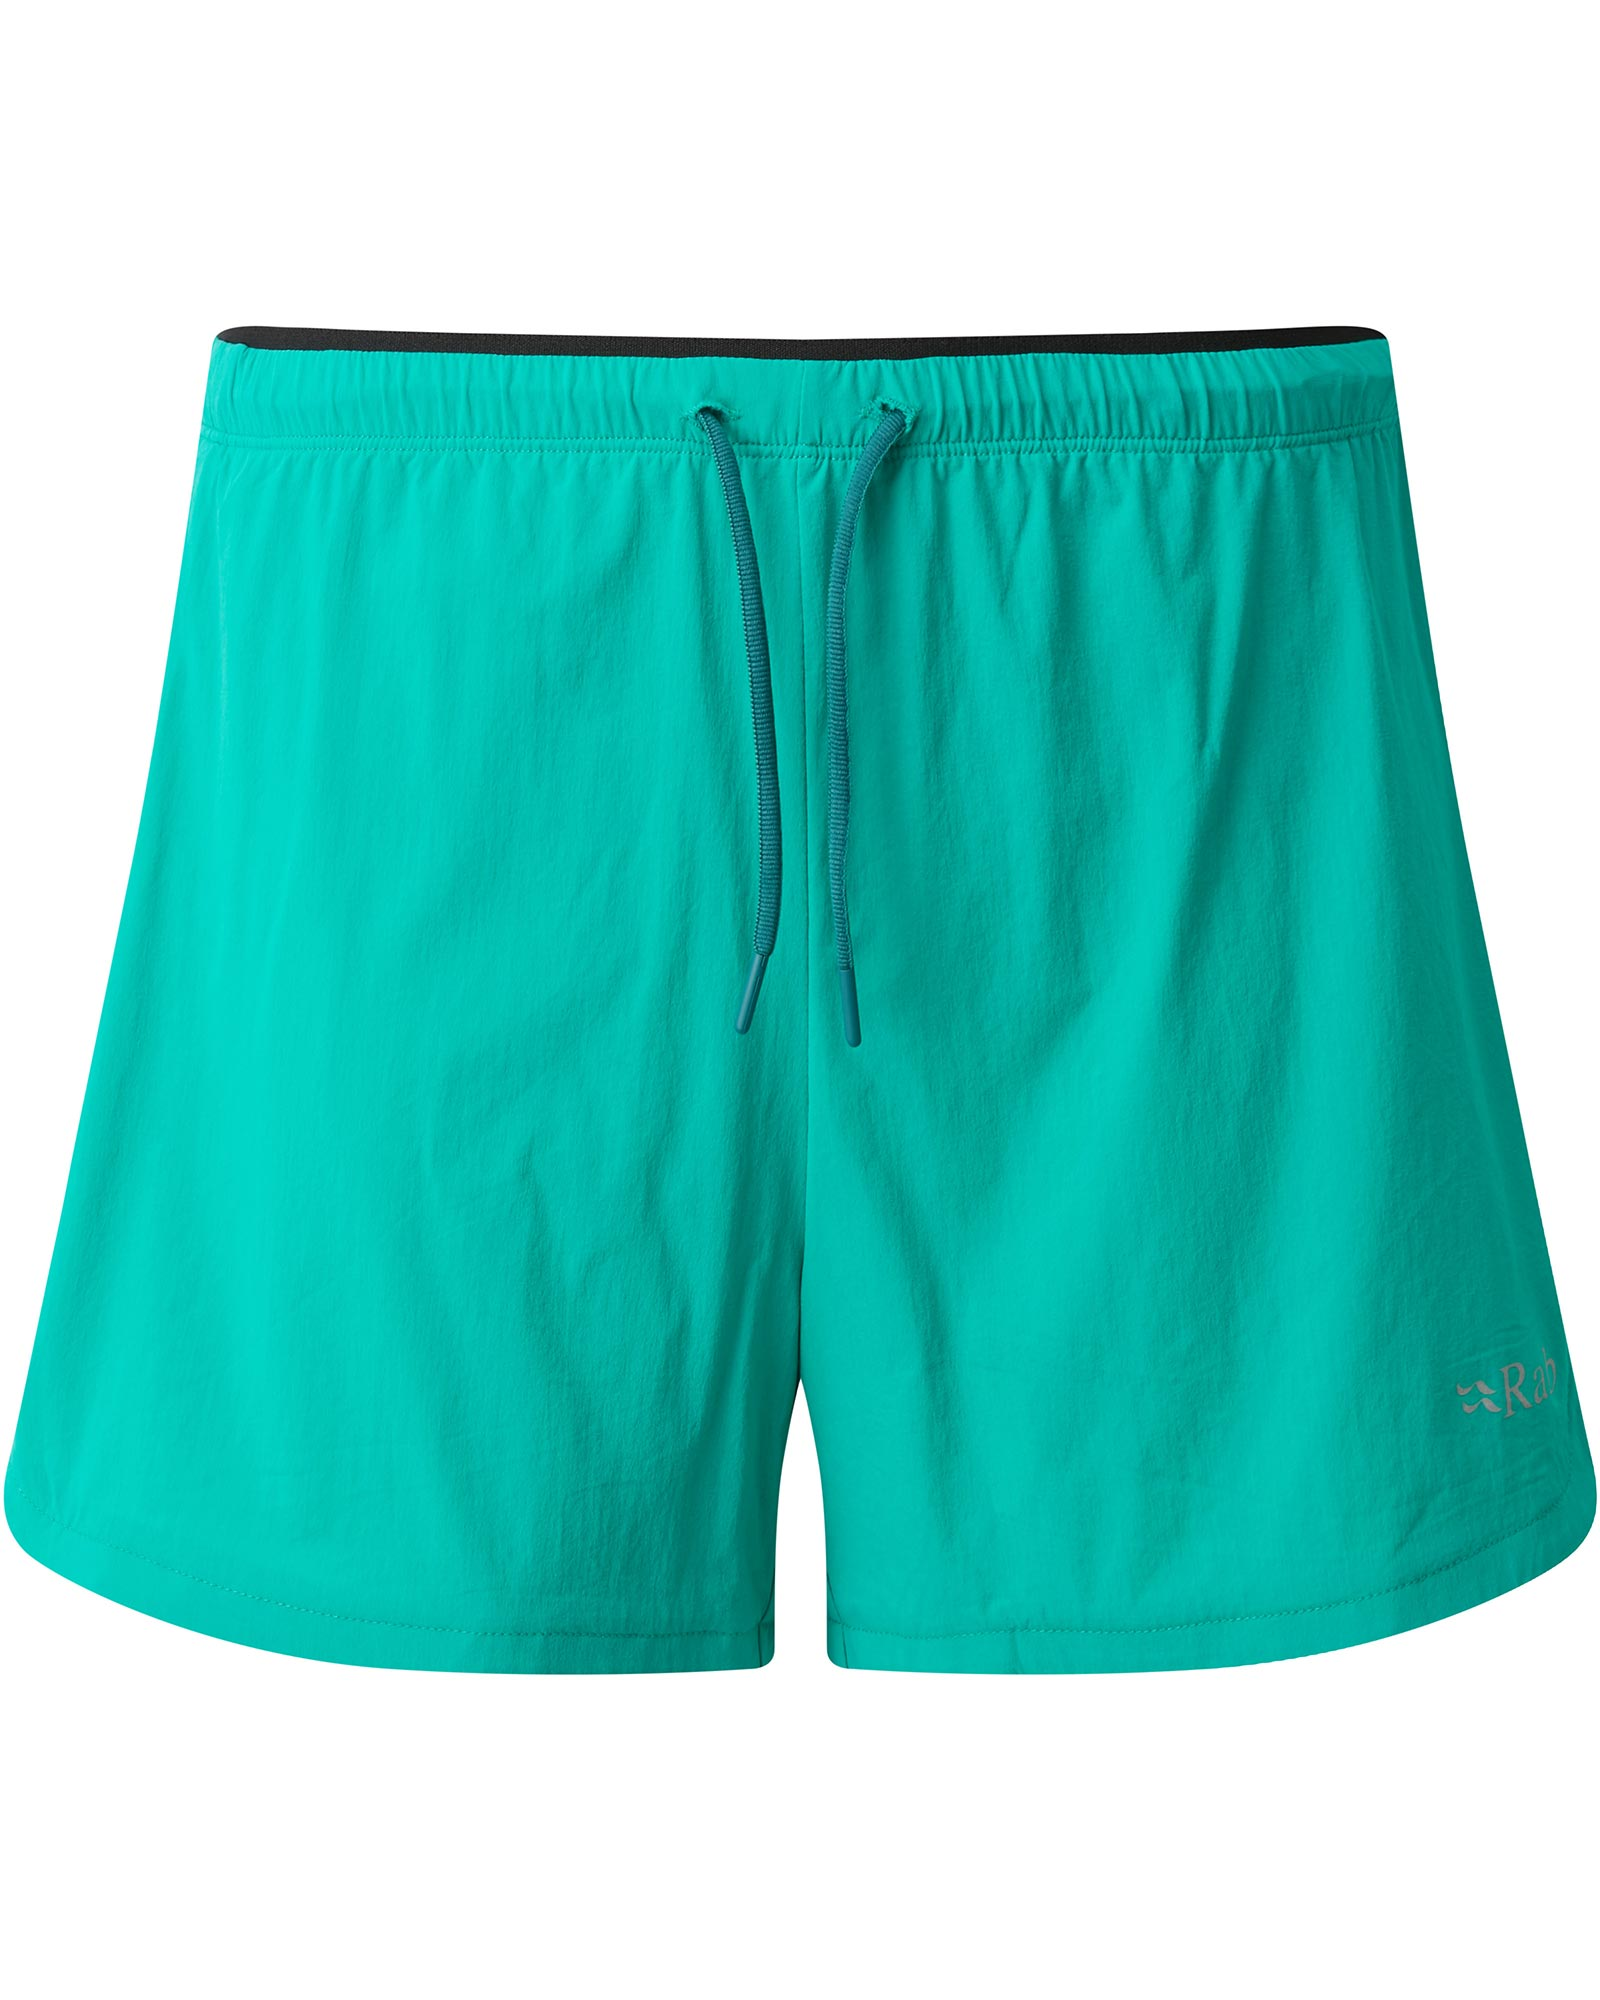 Rab Women's Talus Shorts 0